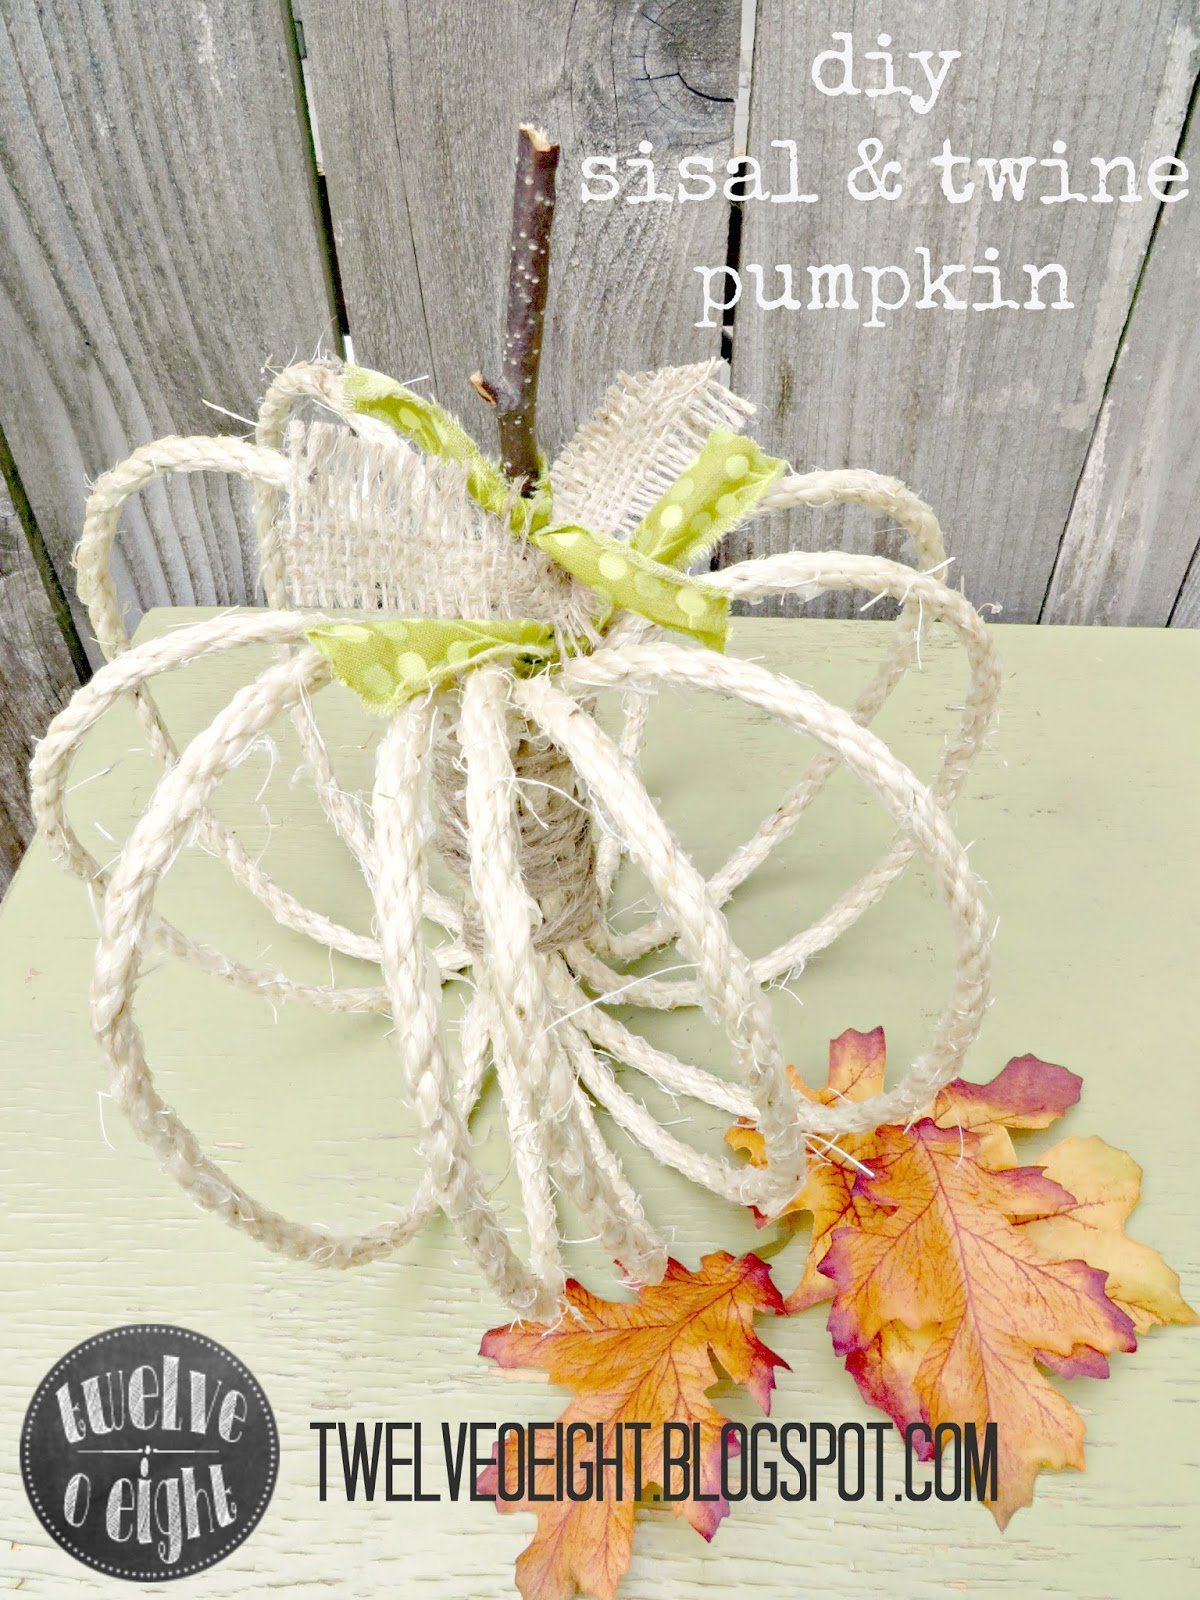 Diy sisal and twine pumpkins for Sisal decoration